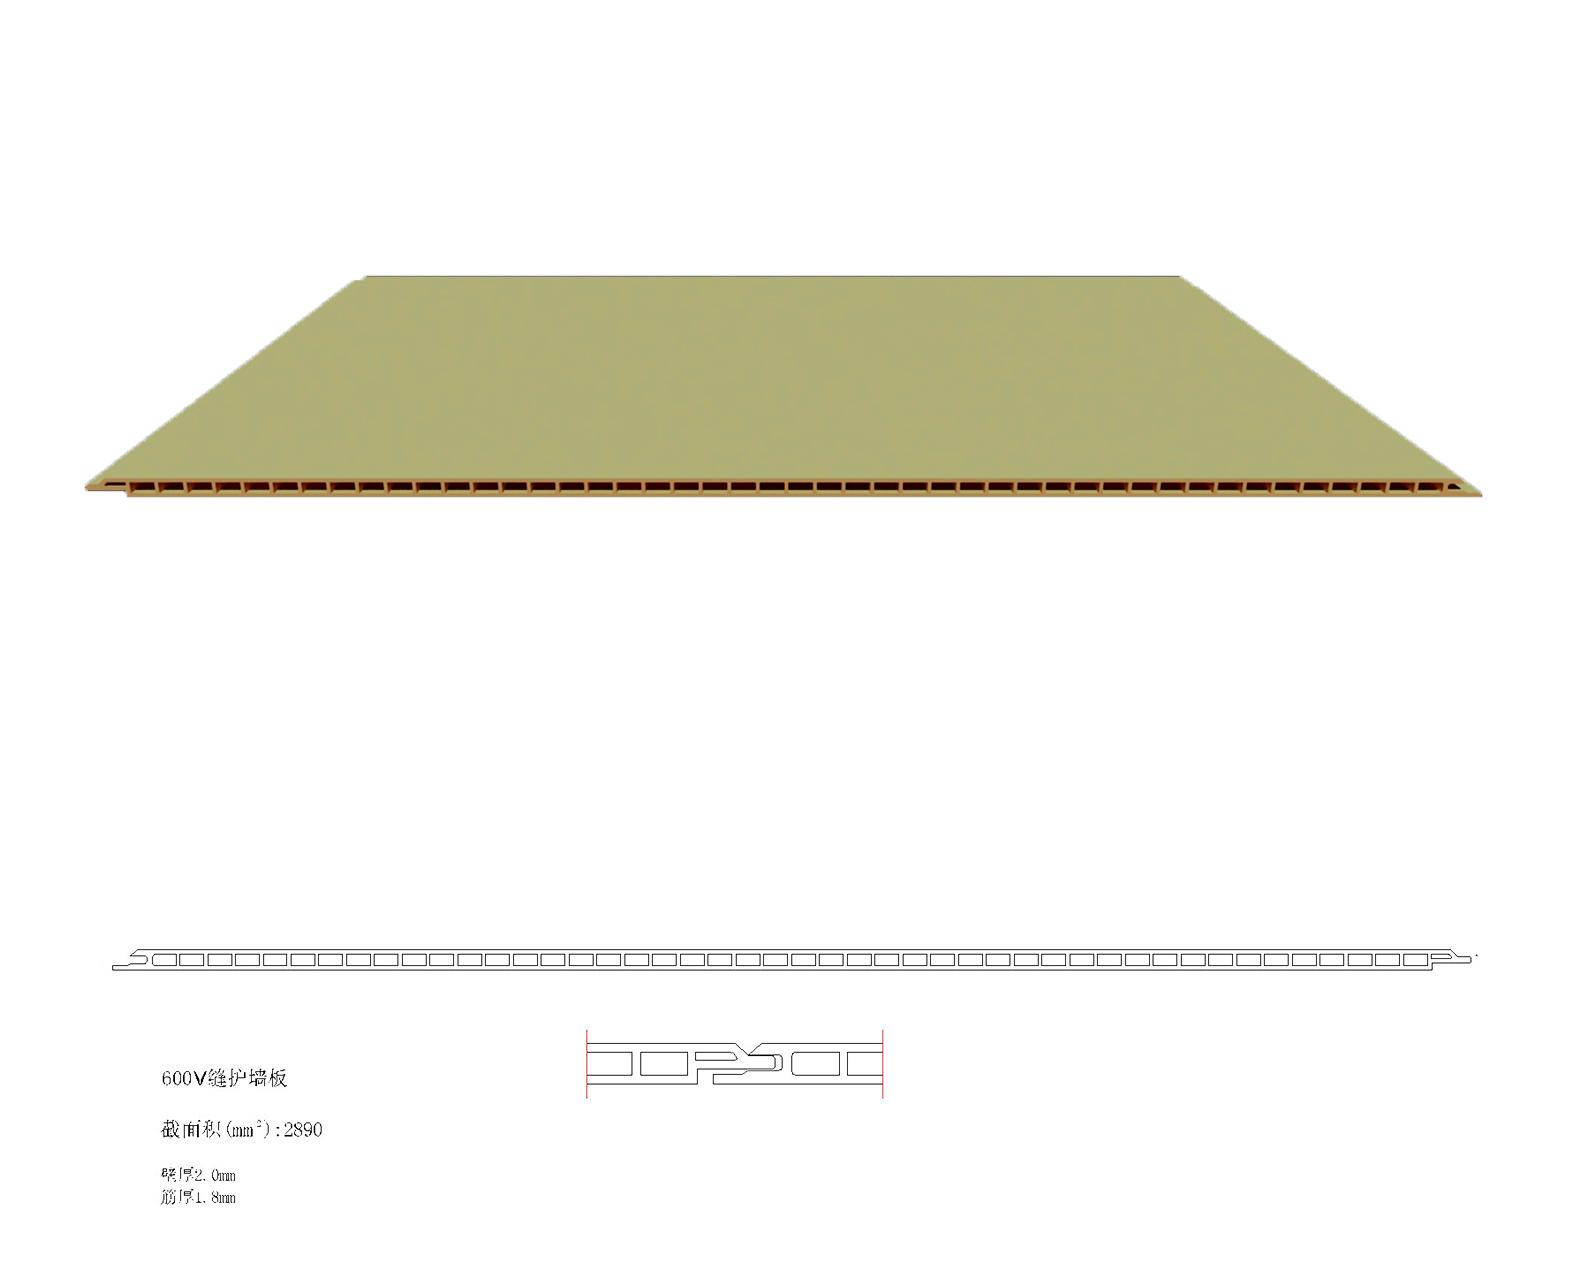 600V缝墙板